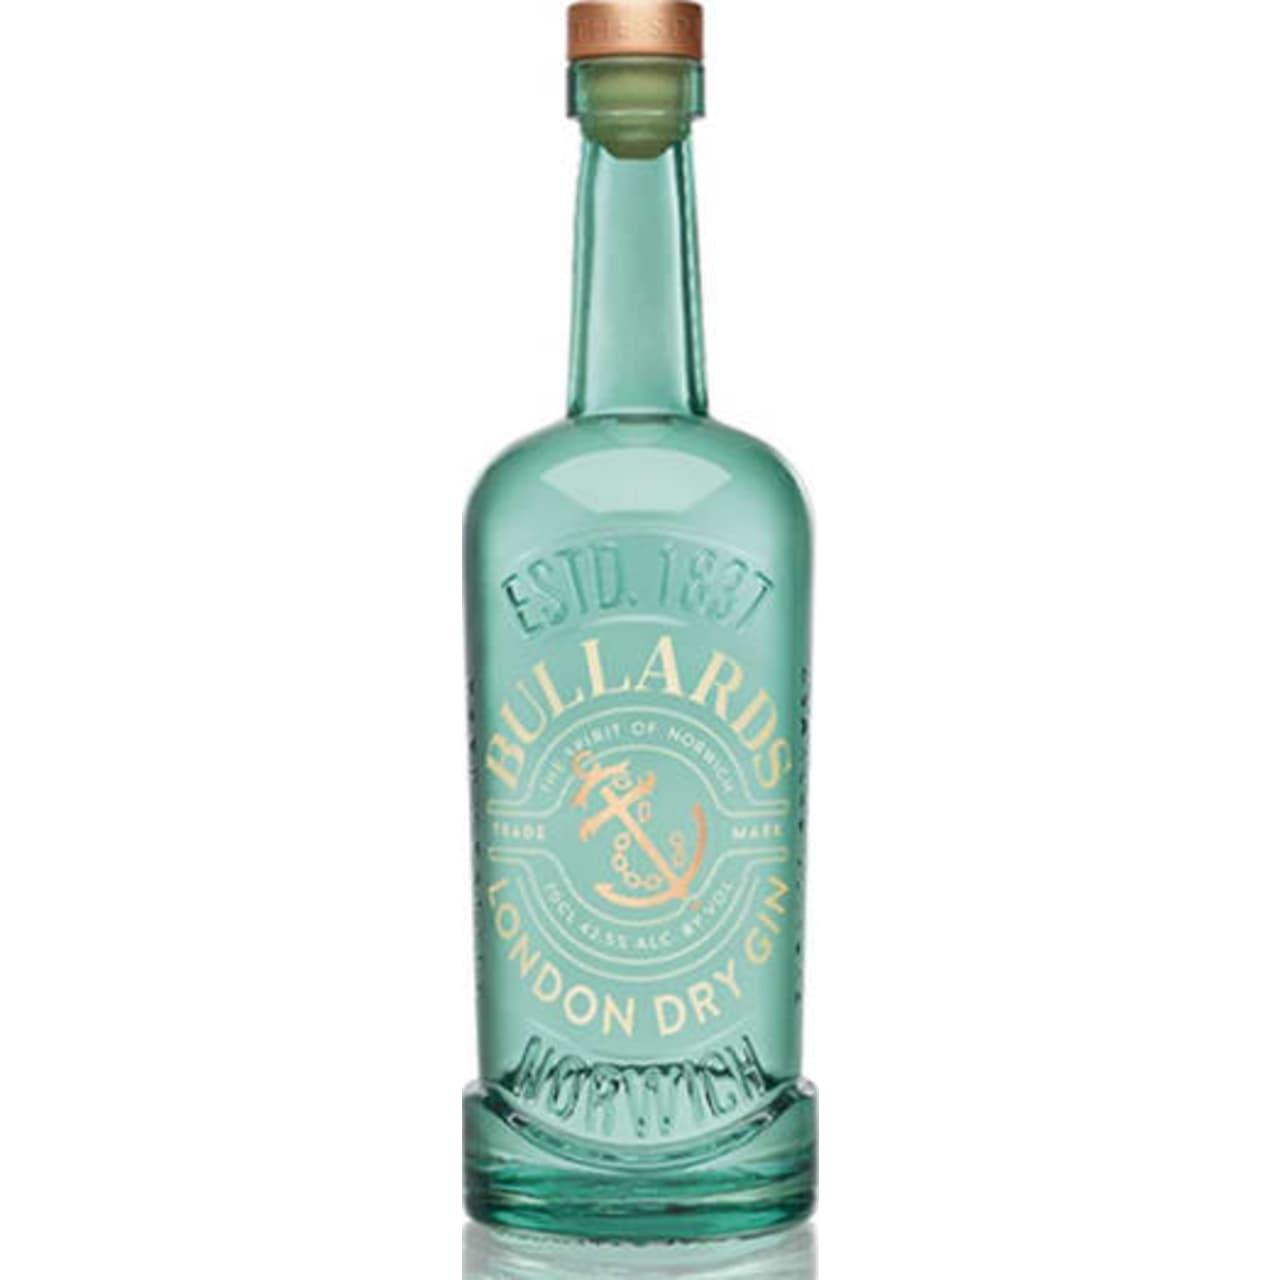 Product Image - Bullards London Dry Gin